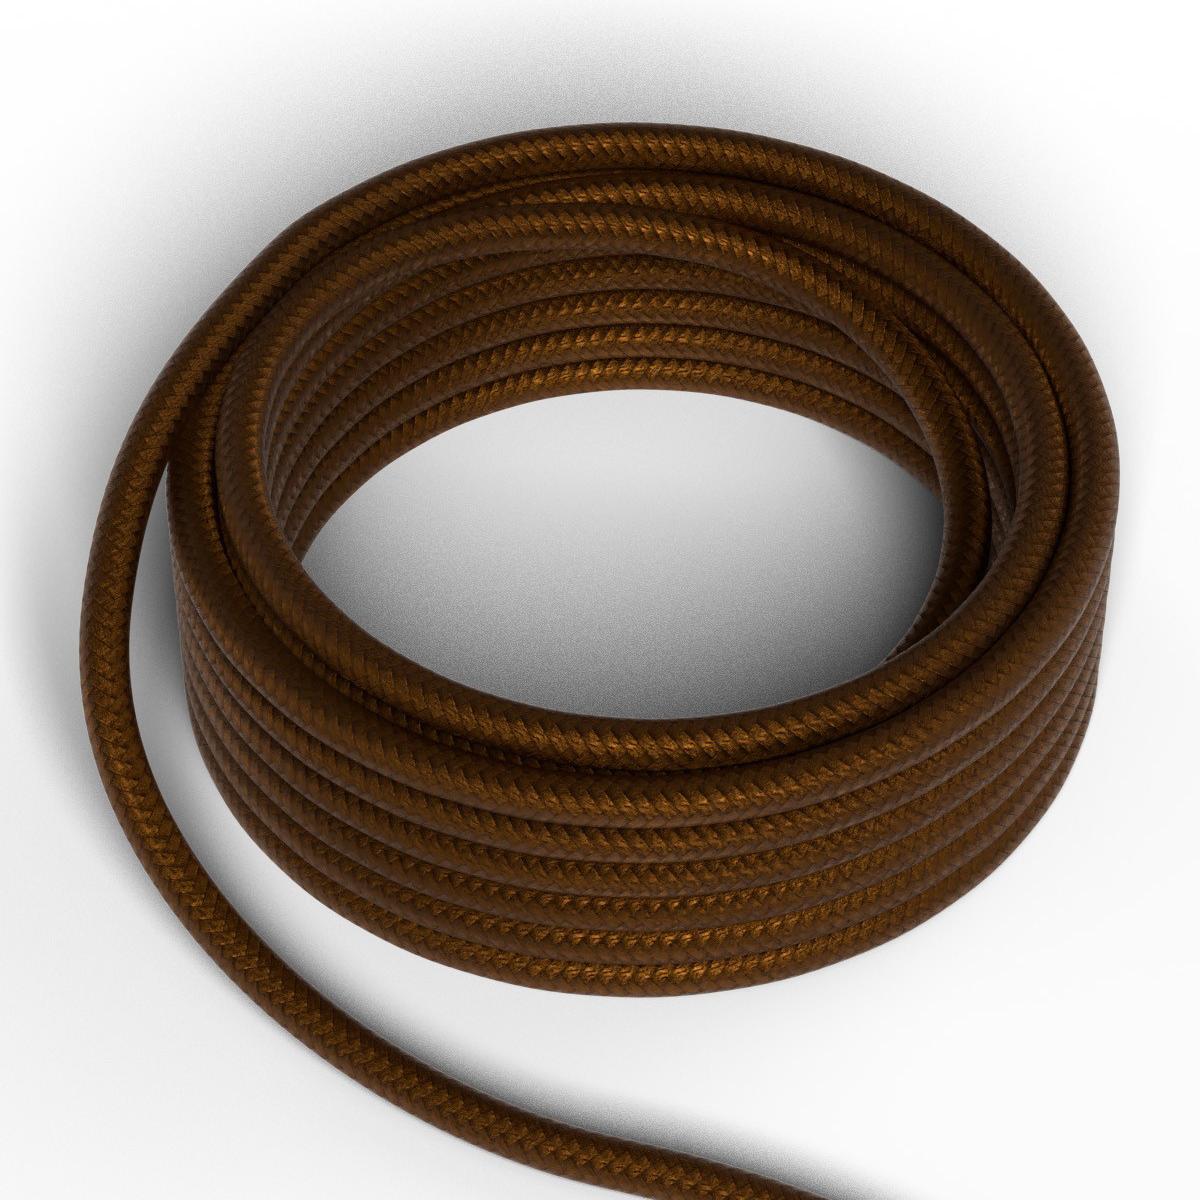 Textilkabel Braun